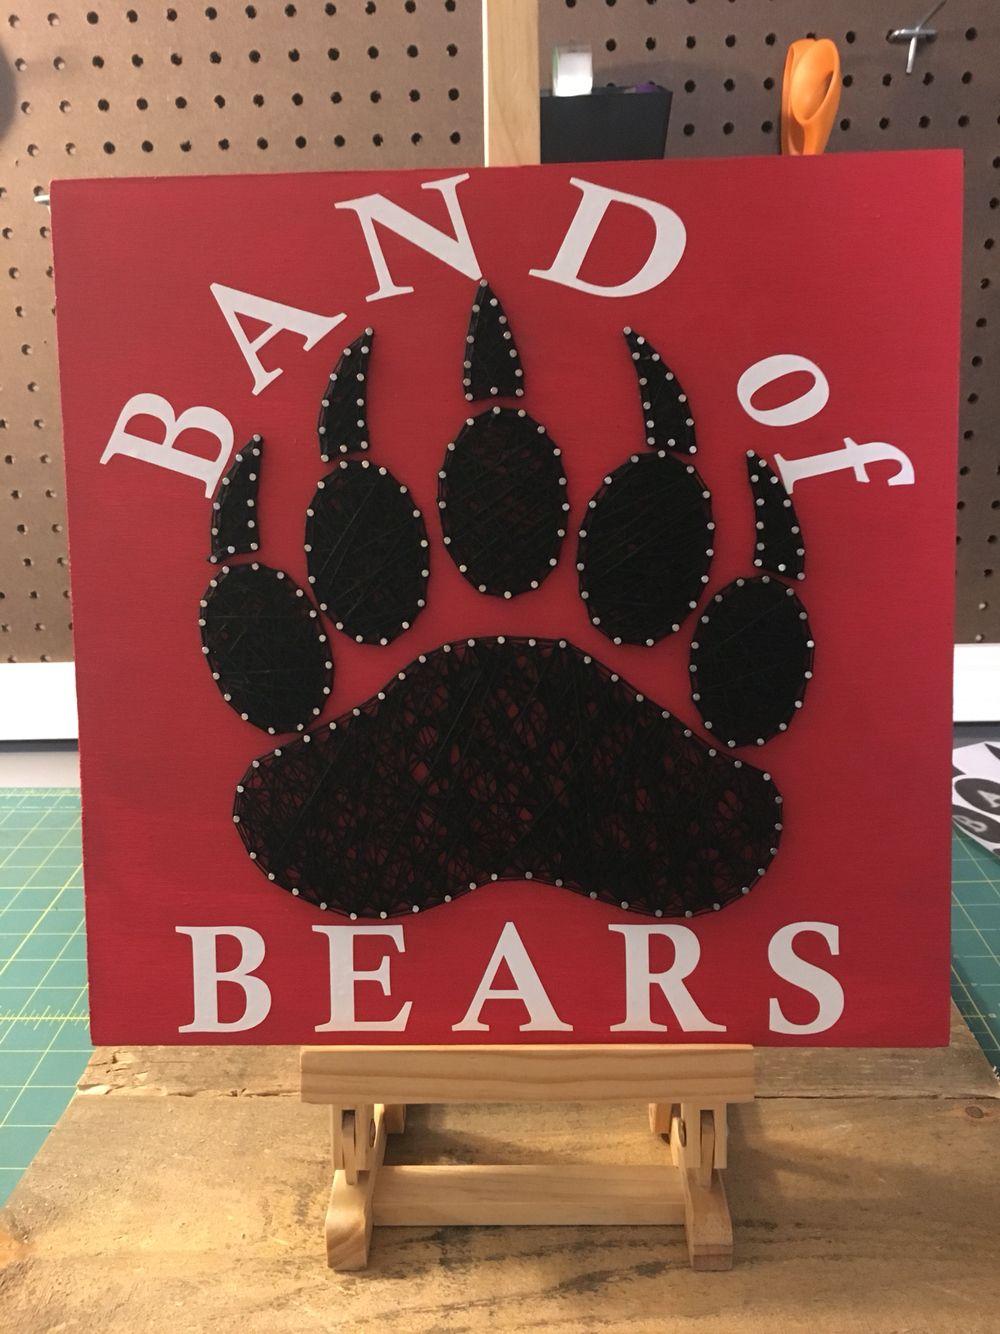 Band of Bears